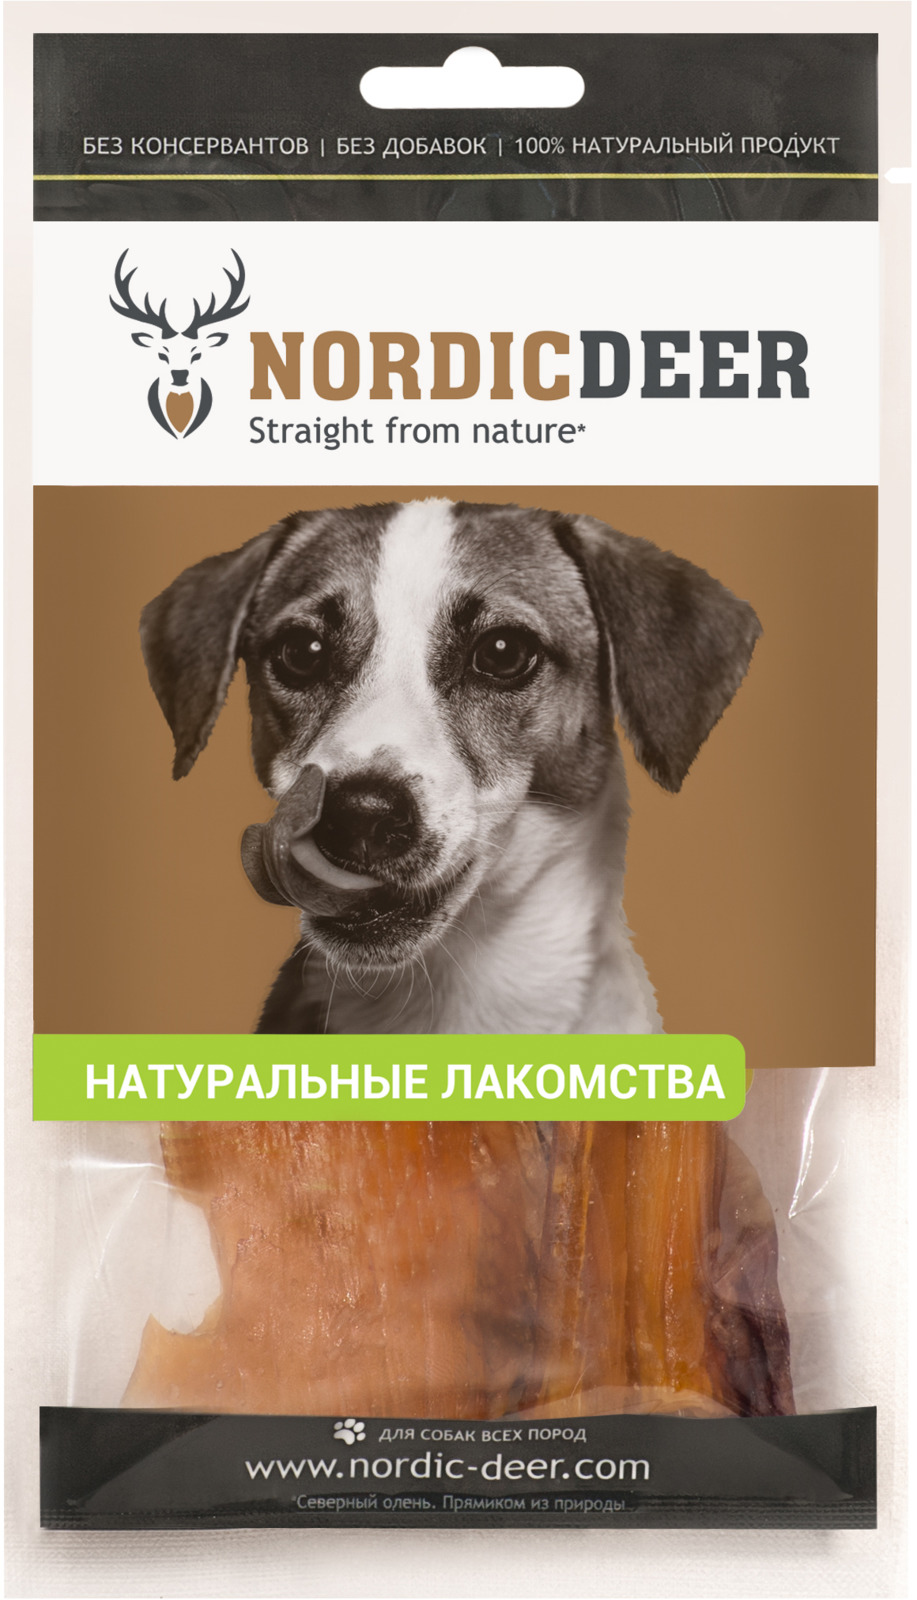 Лакомство для собак Nordic Deer Сухожилия говяжьи, 10 см, 40 г nordic modern living room bedroom background simple english deer head decorative